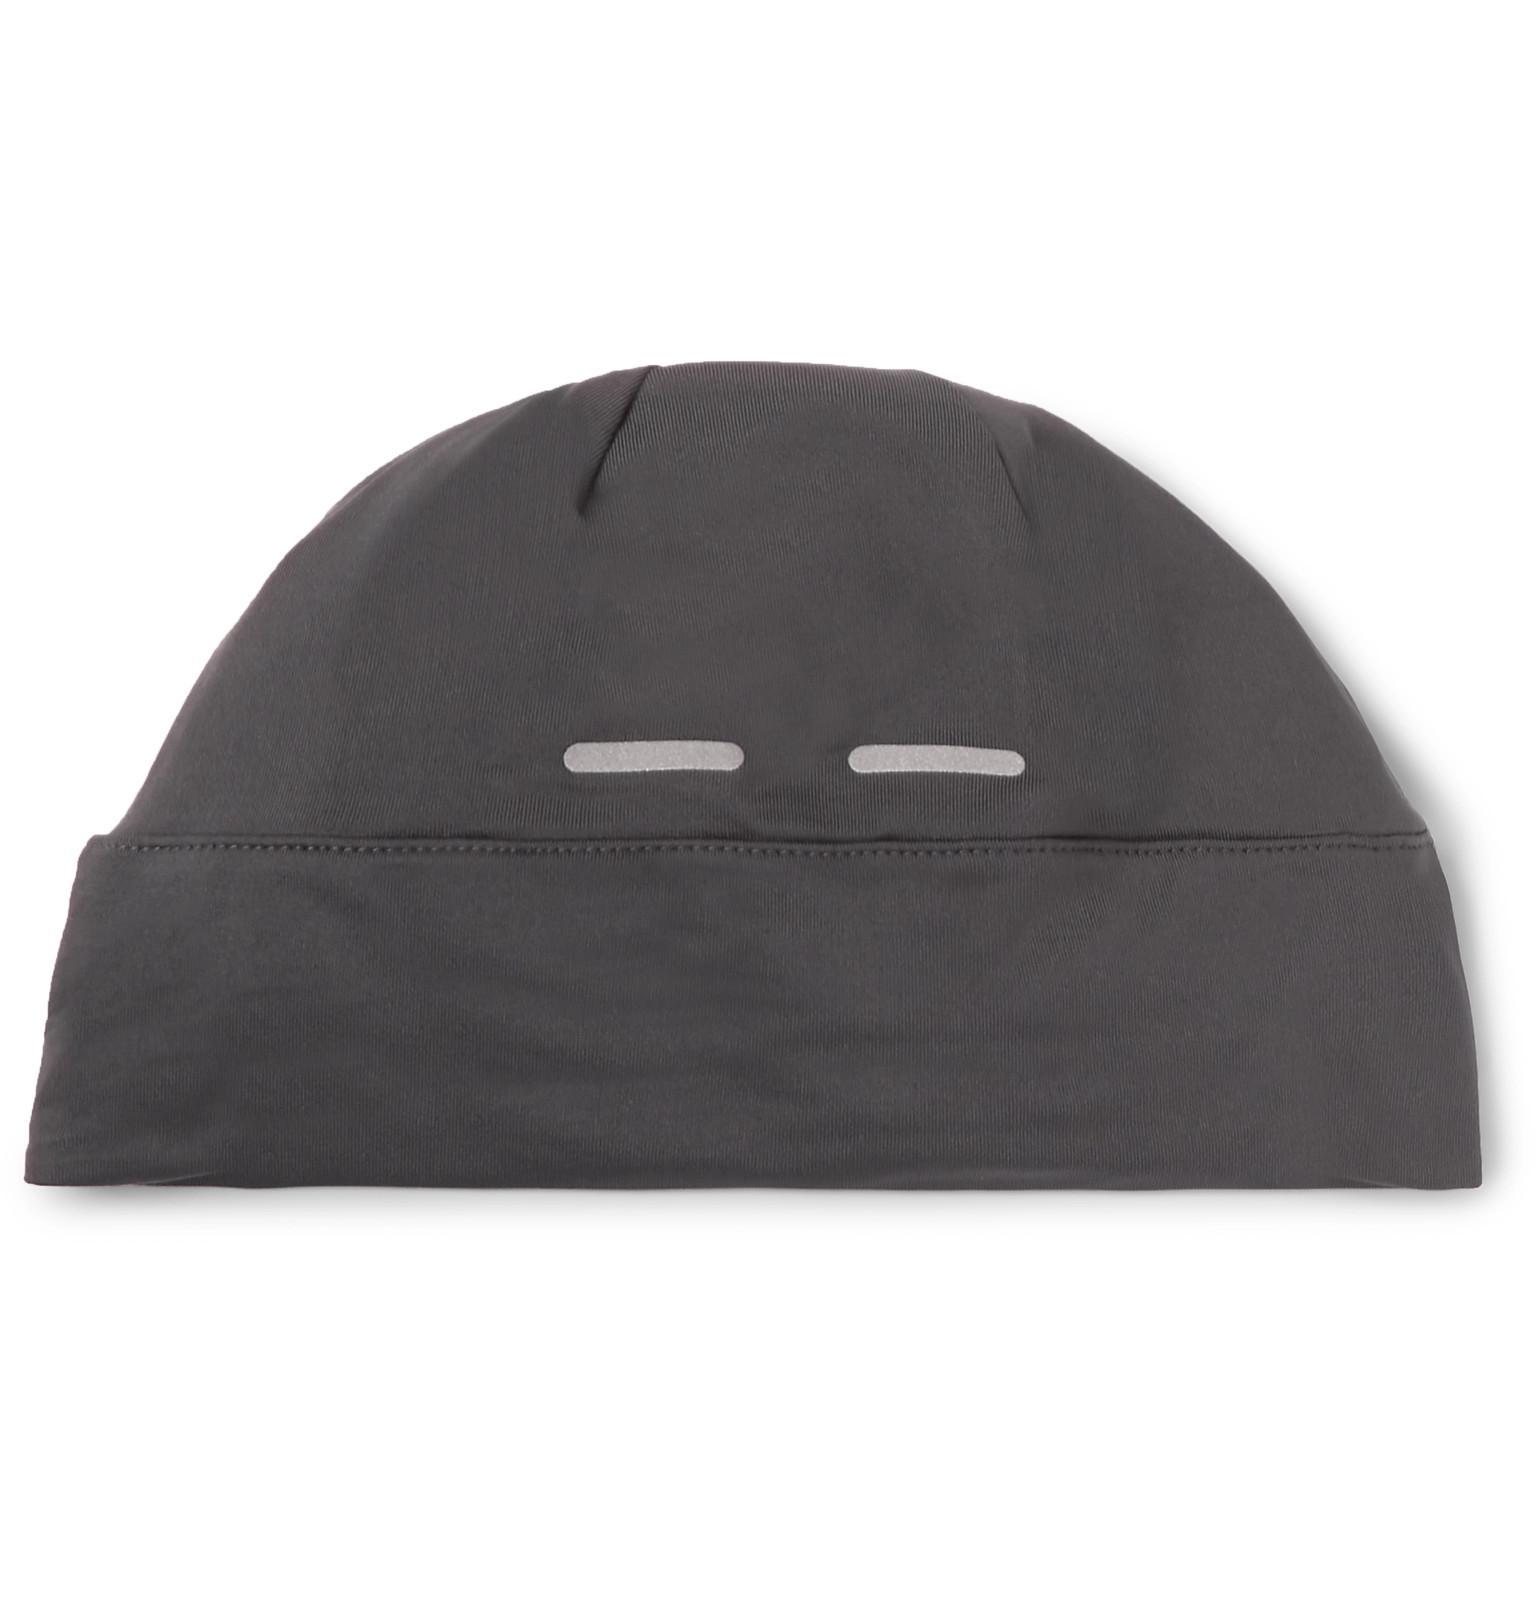 5e40dd865d6 Nike - Gray Dri-fit Hat And Gloves Set for Men - Lyst. View fullscreen